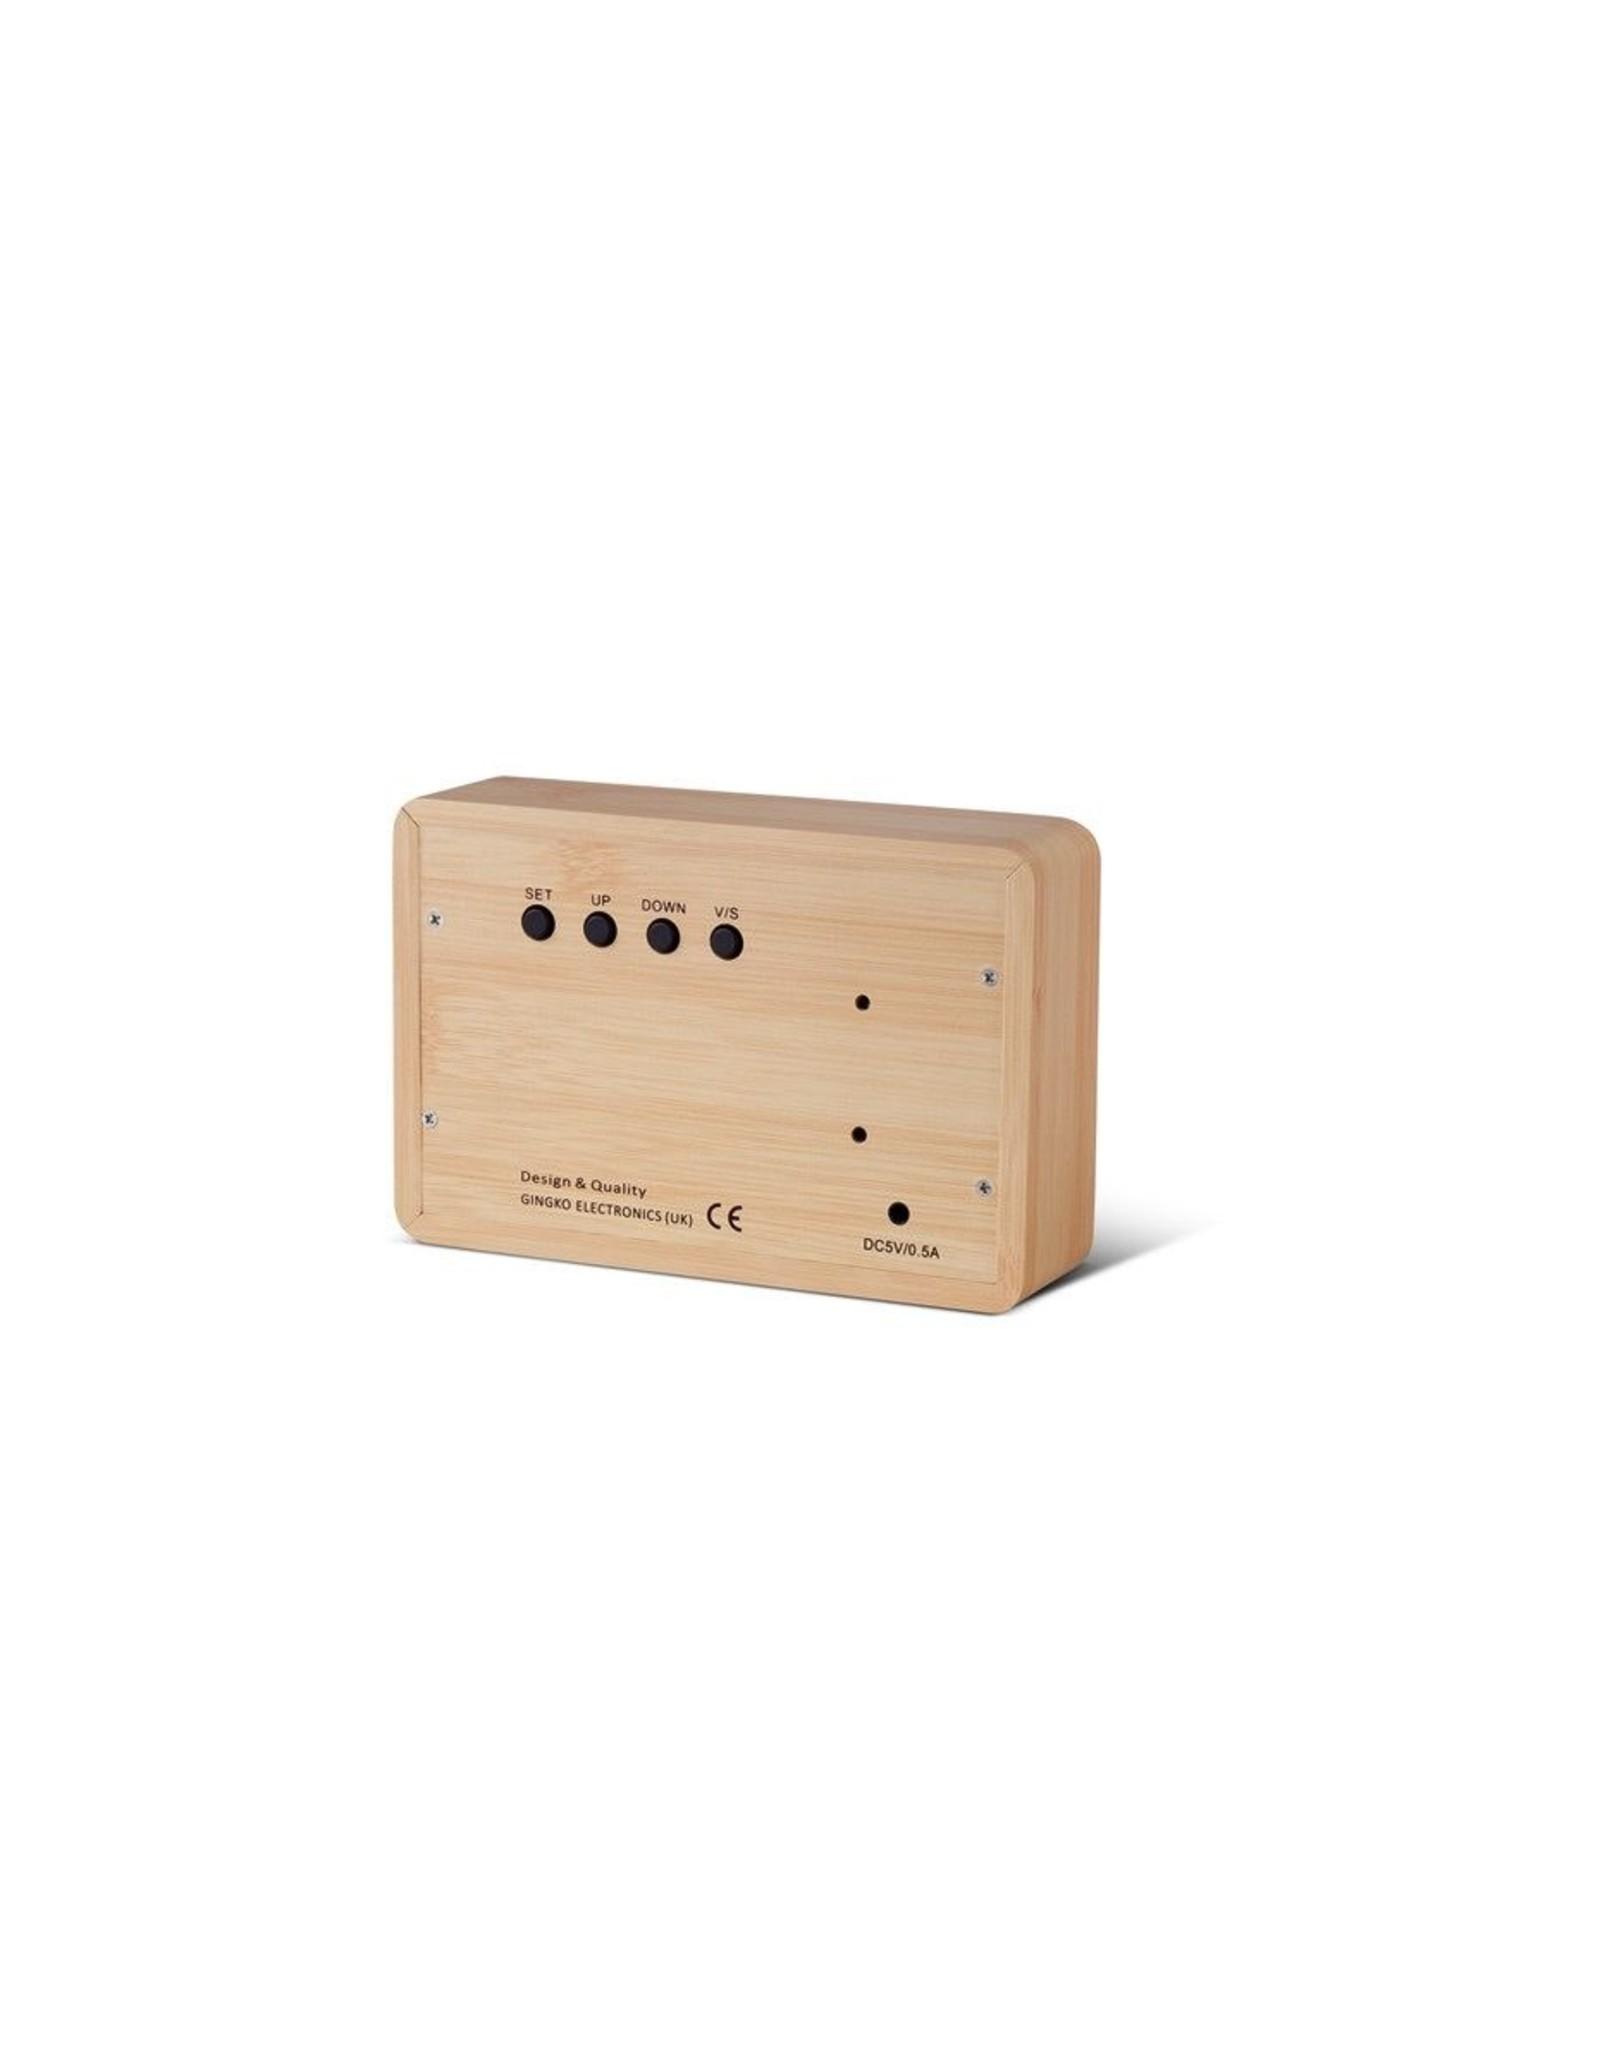 Gingko electronics LTD Brick Beech Click Clock